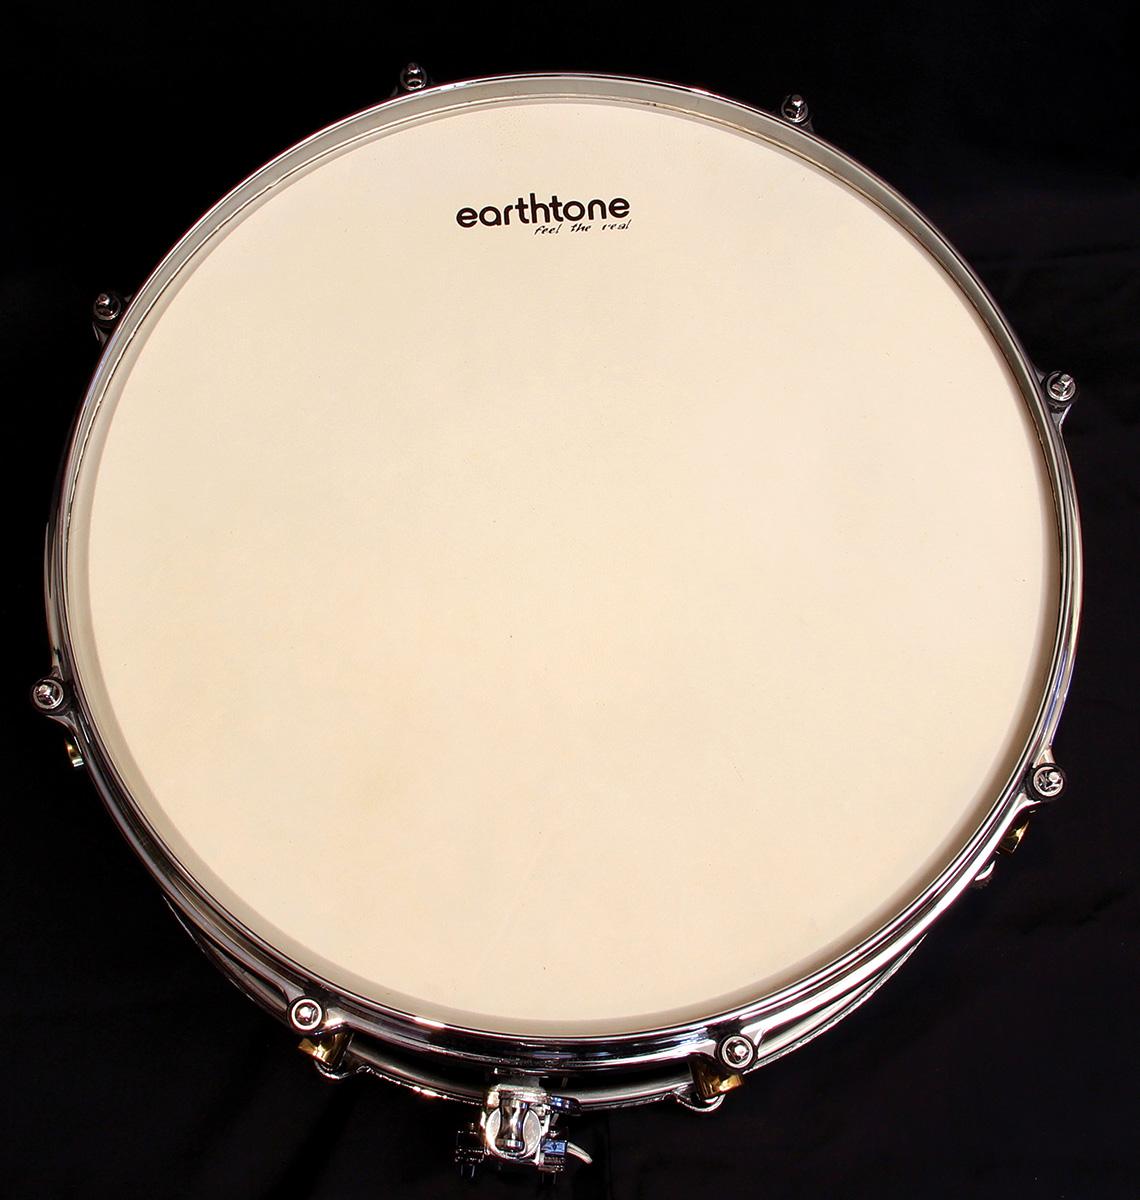 earthtone calfskin drum heads for snares toms btn music uk. Black Bedroom Furniture Sets. Home Design Ideas